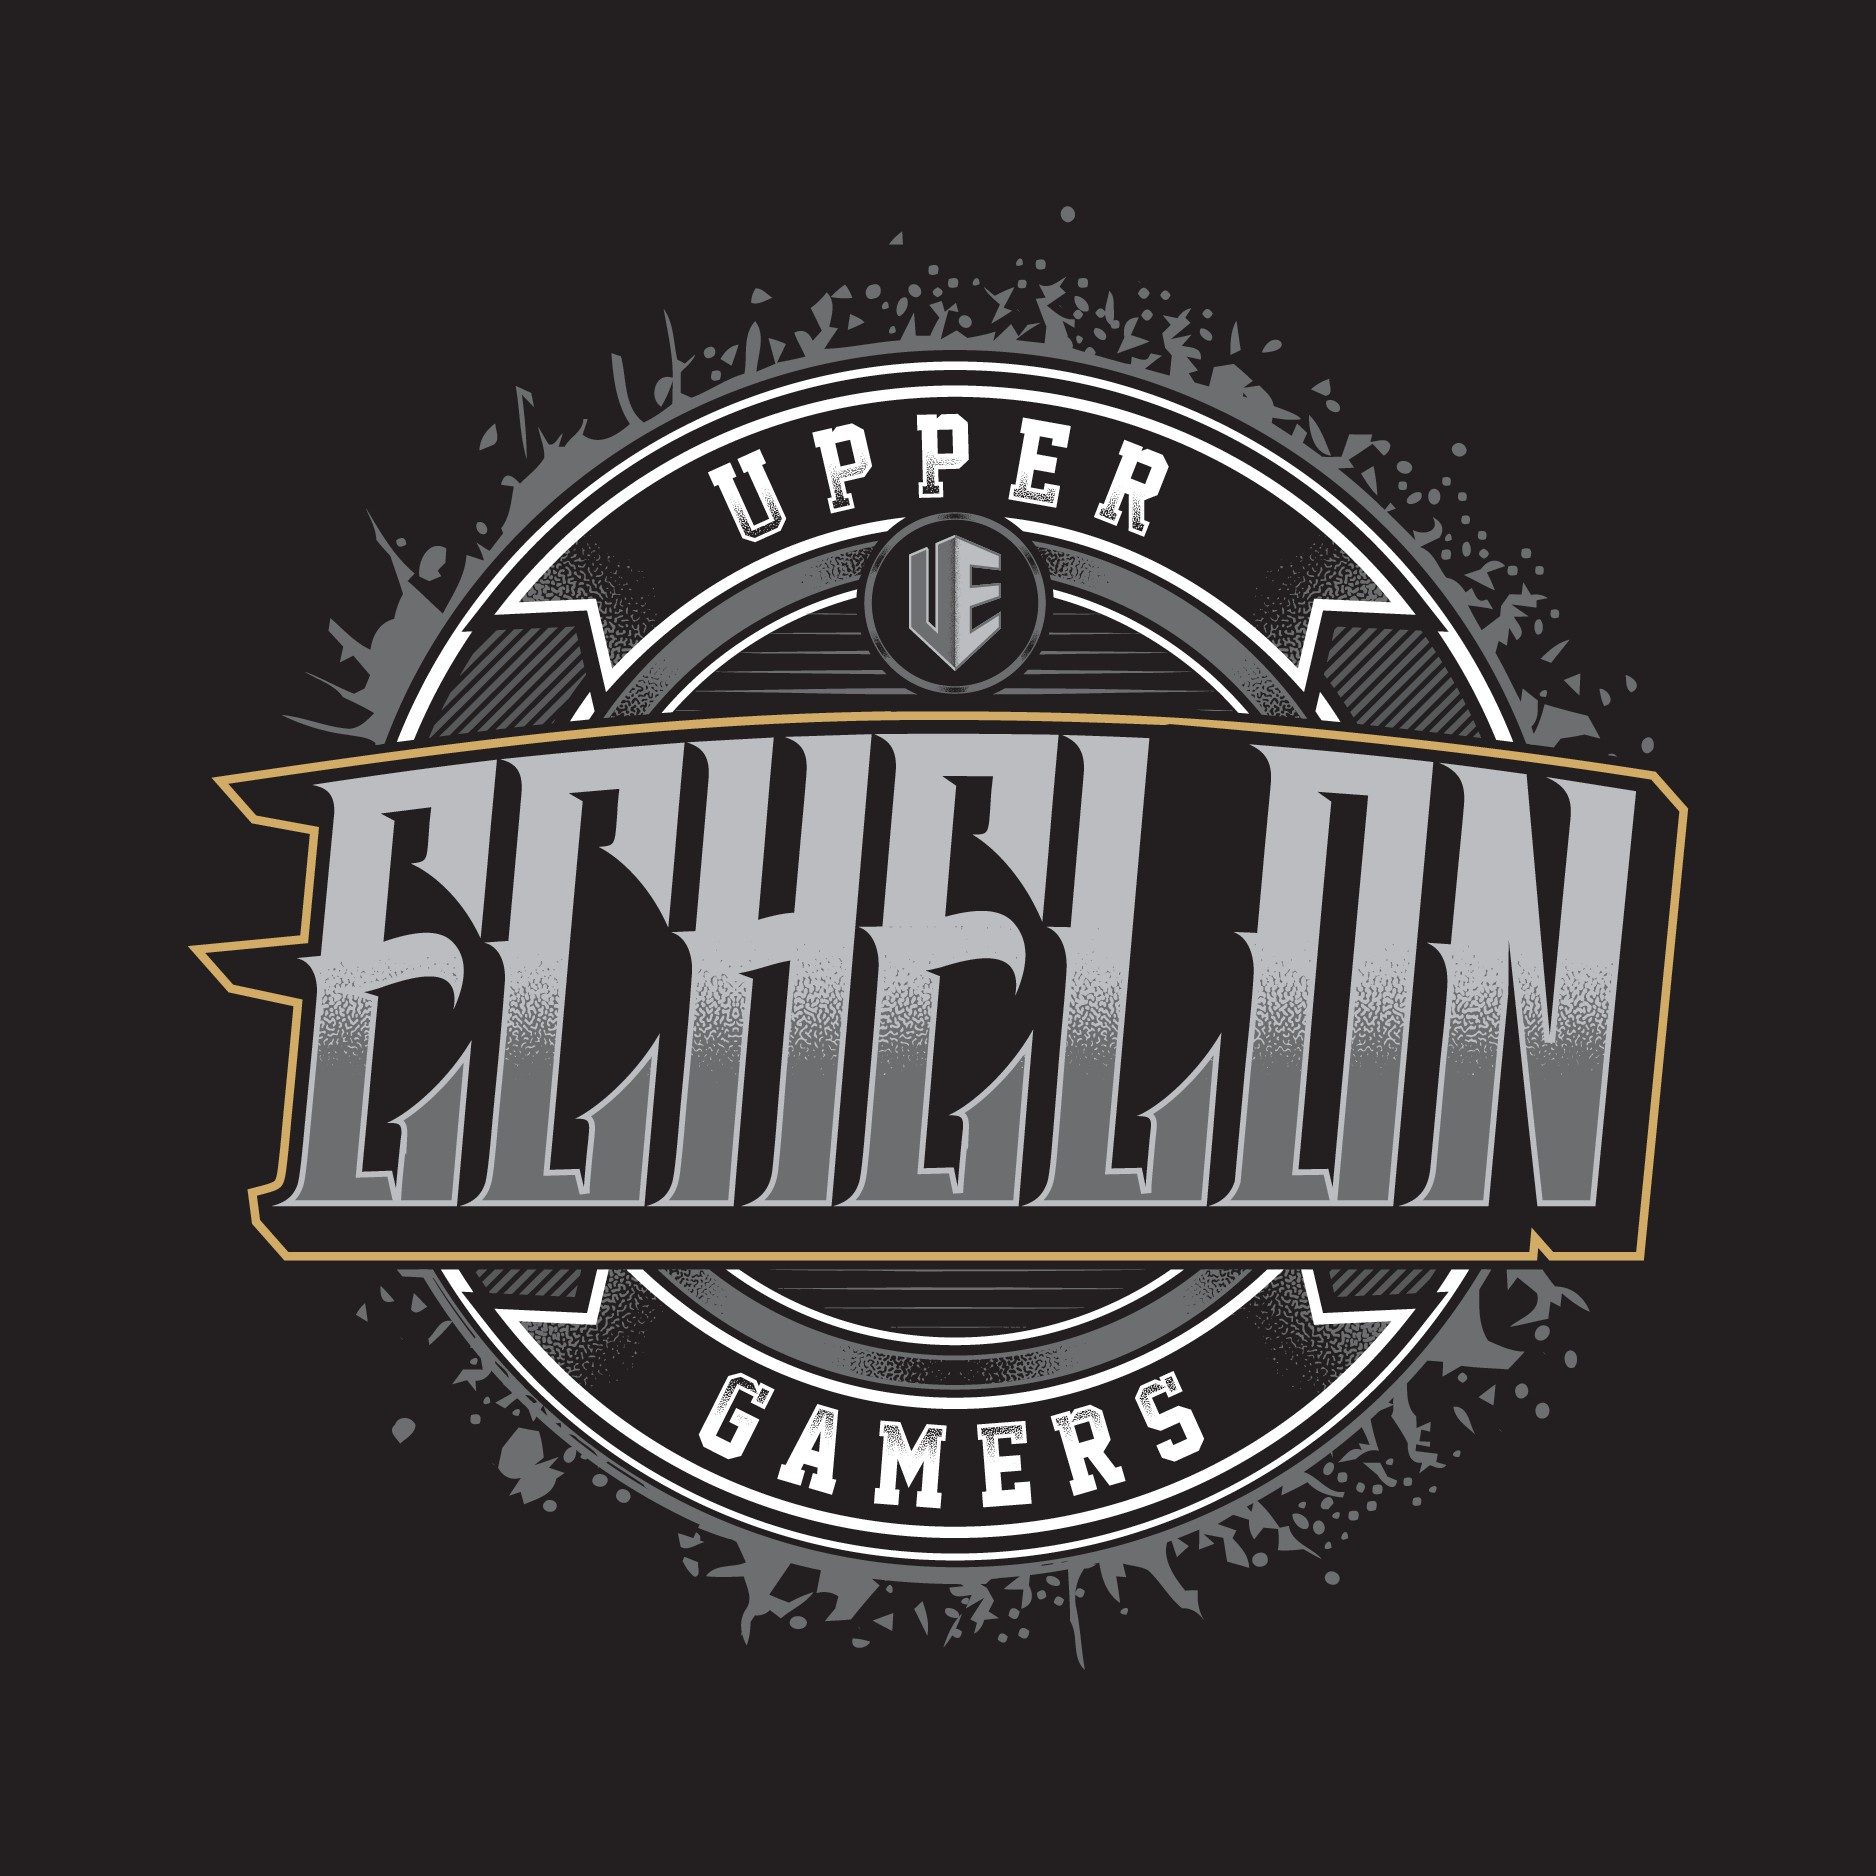 Upper Echelon Gamers Quarter Mil Subscriber Contest